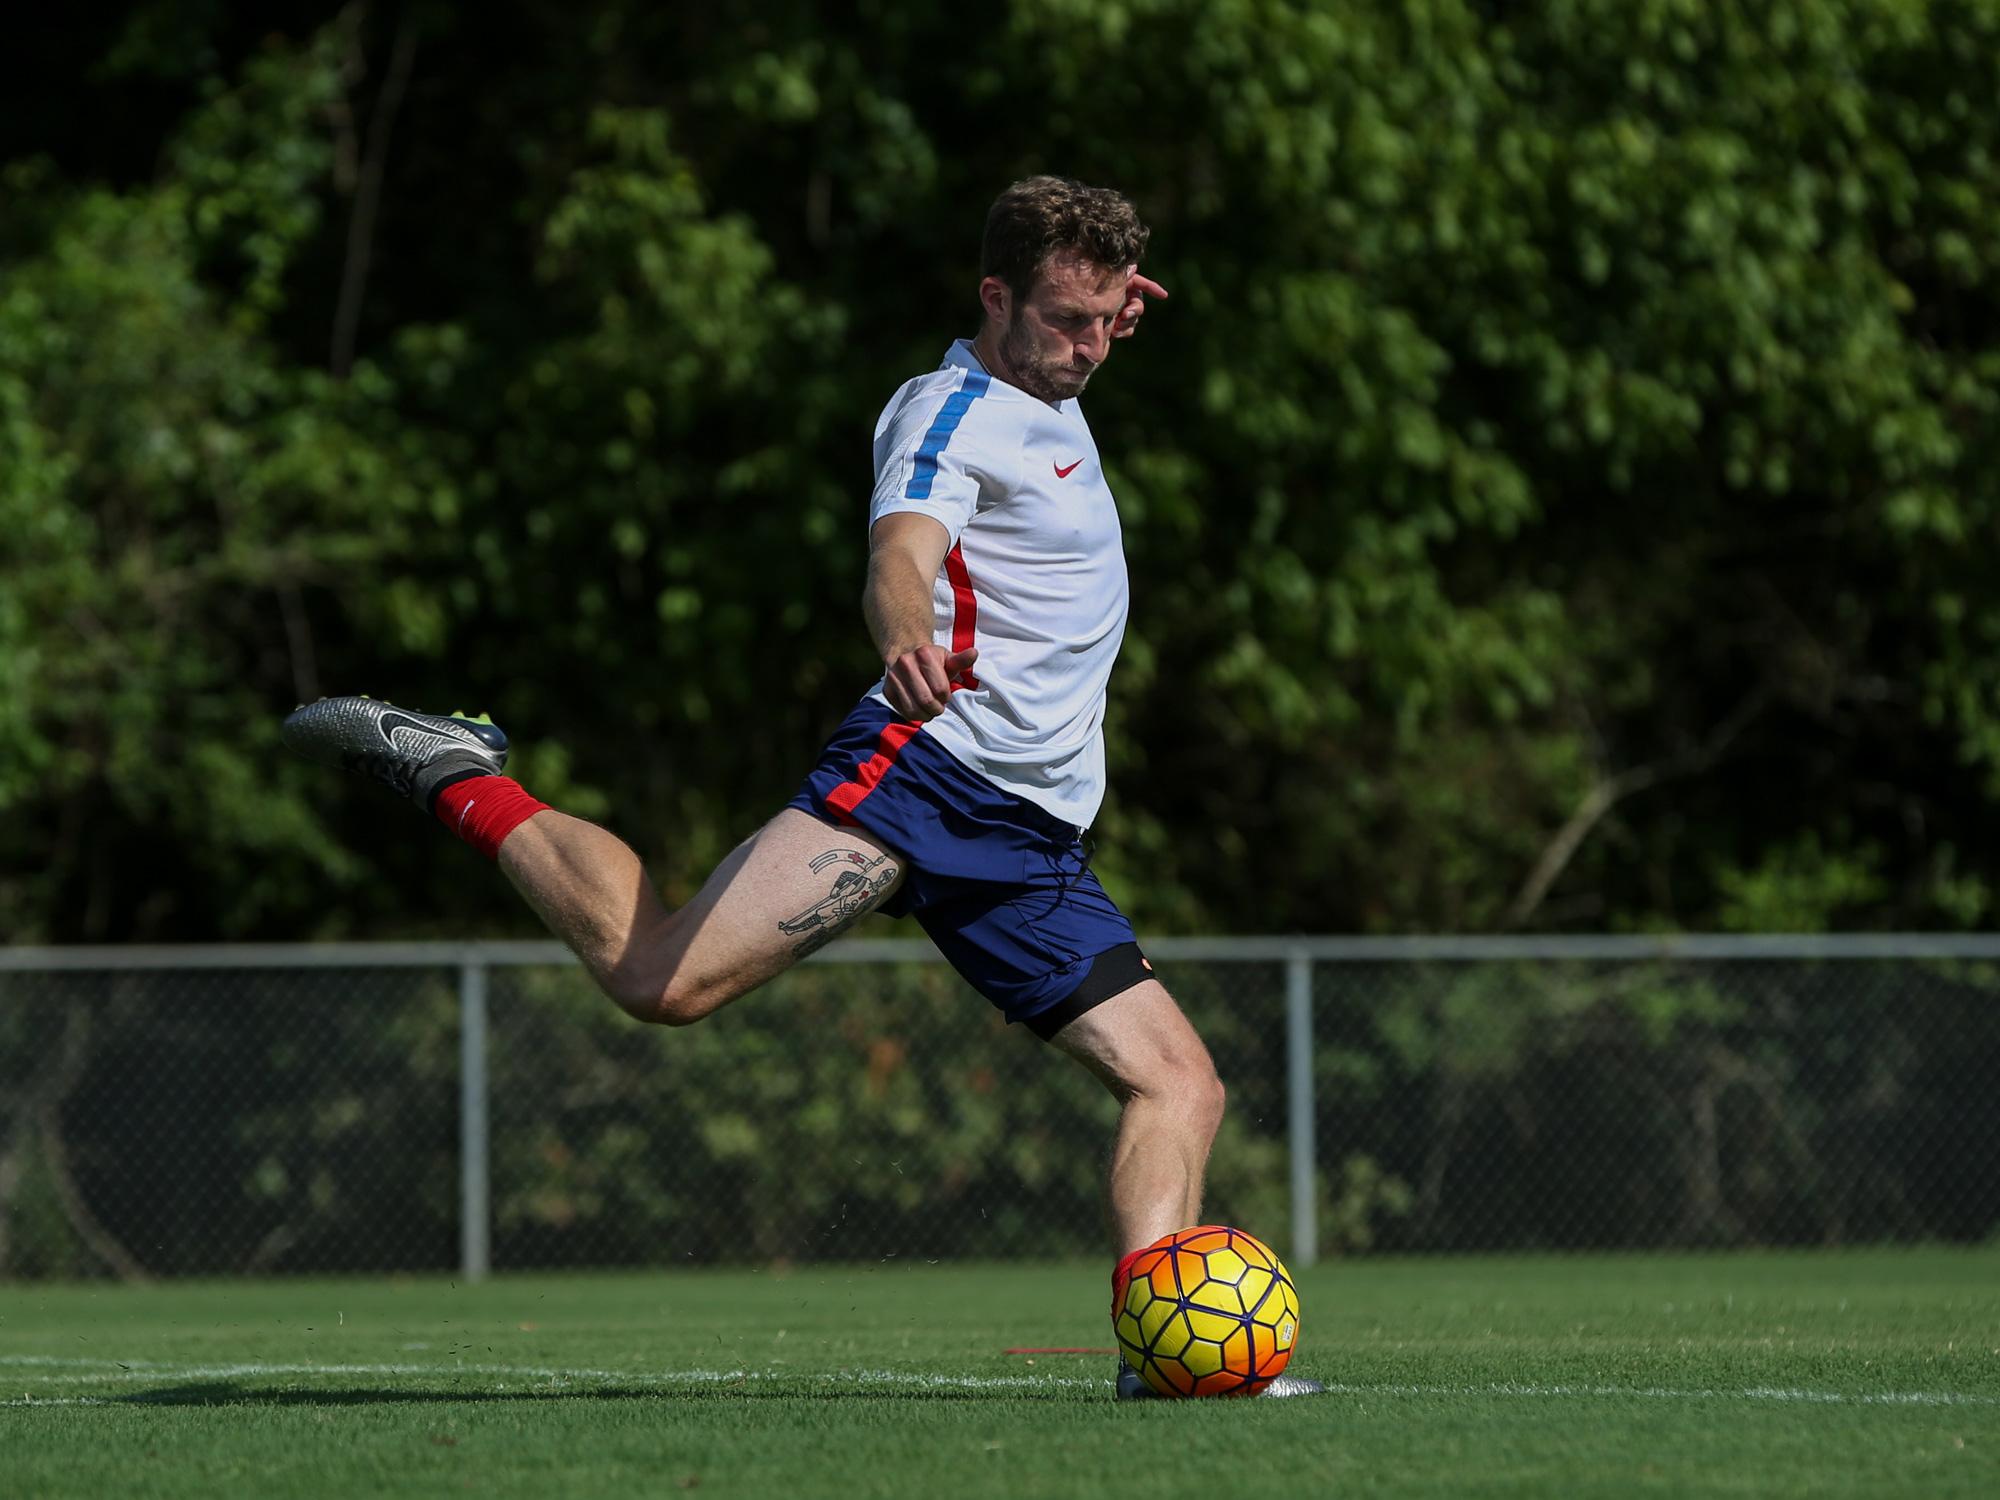 Josh Burnais plays for the USA Paralympics team